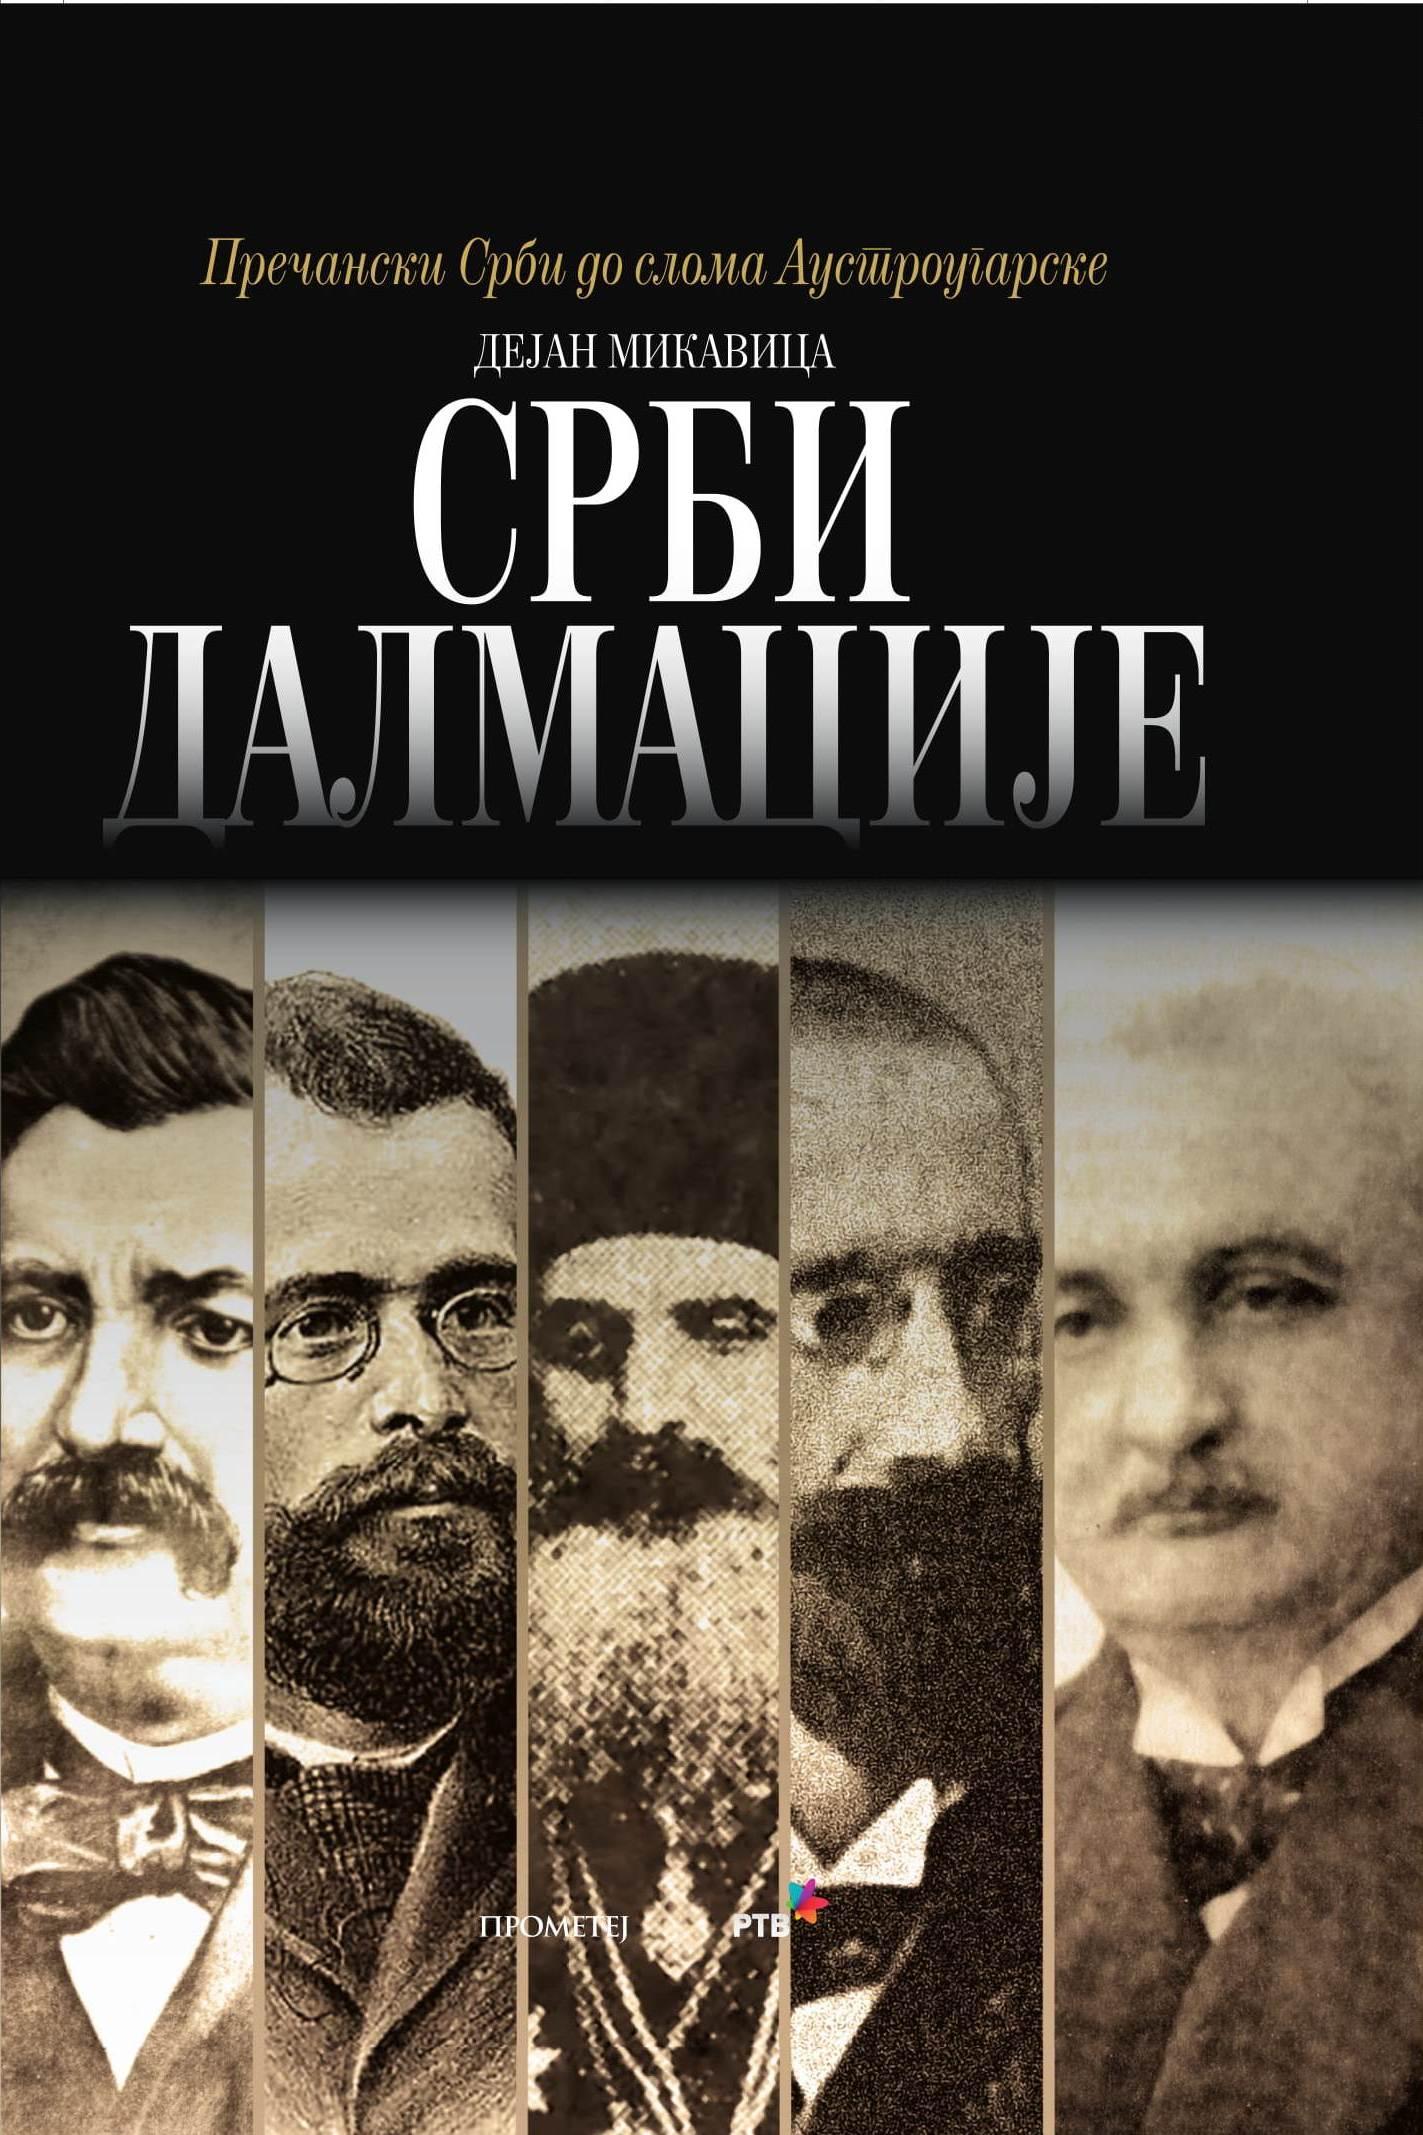 Srbi Dalmacije